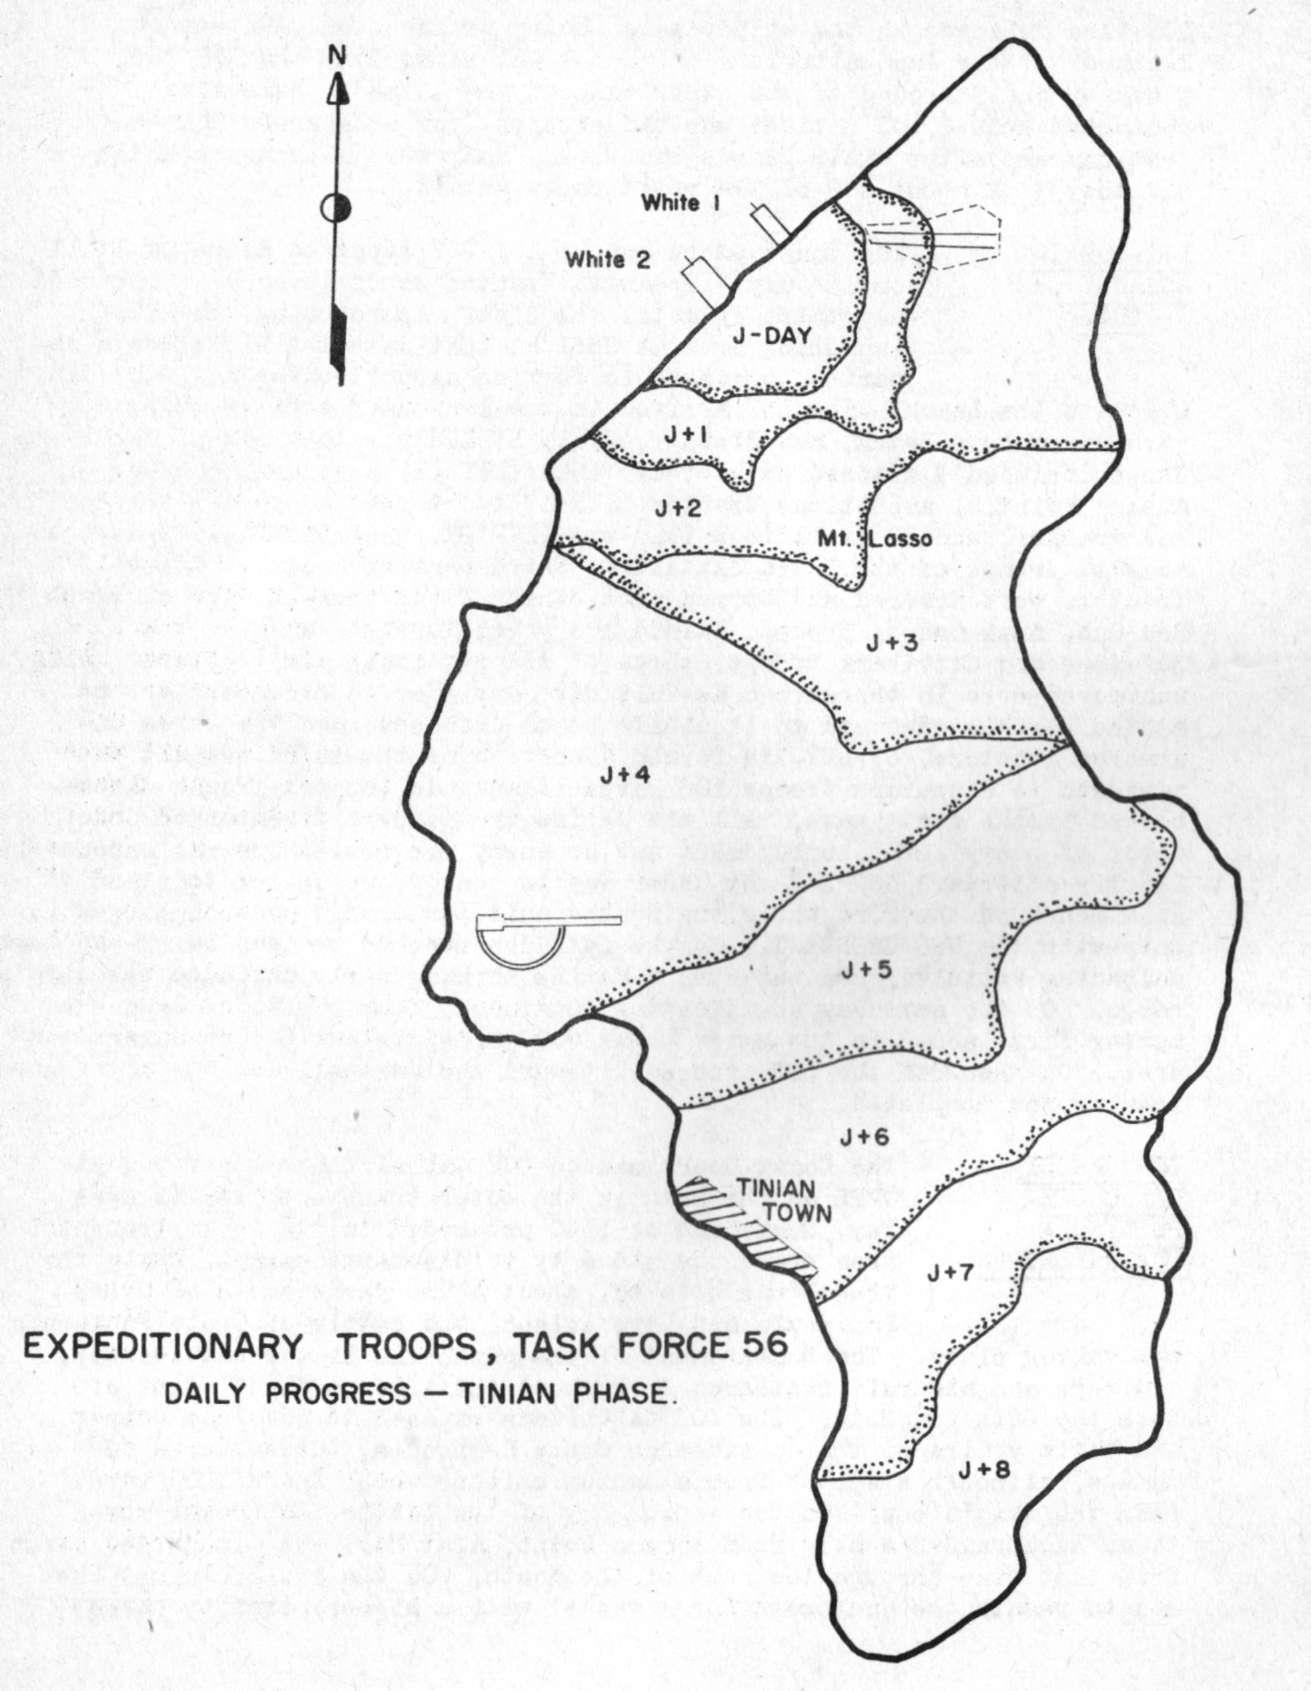 hyperwar the coast guard at war vi the pacific 16 Guam Population 2017 daily progress tinian phase